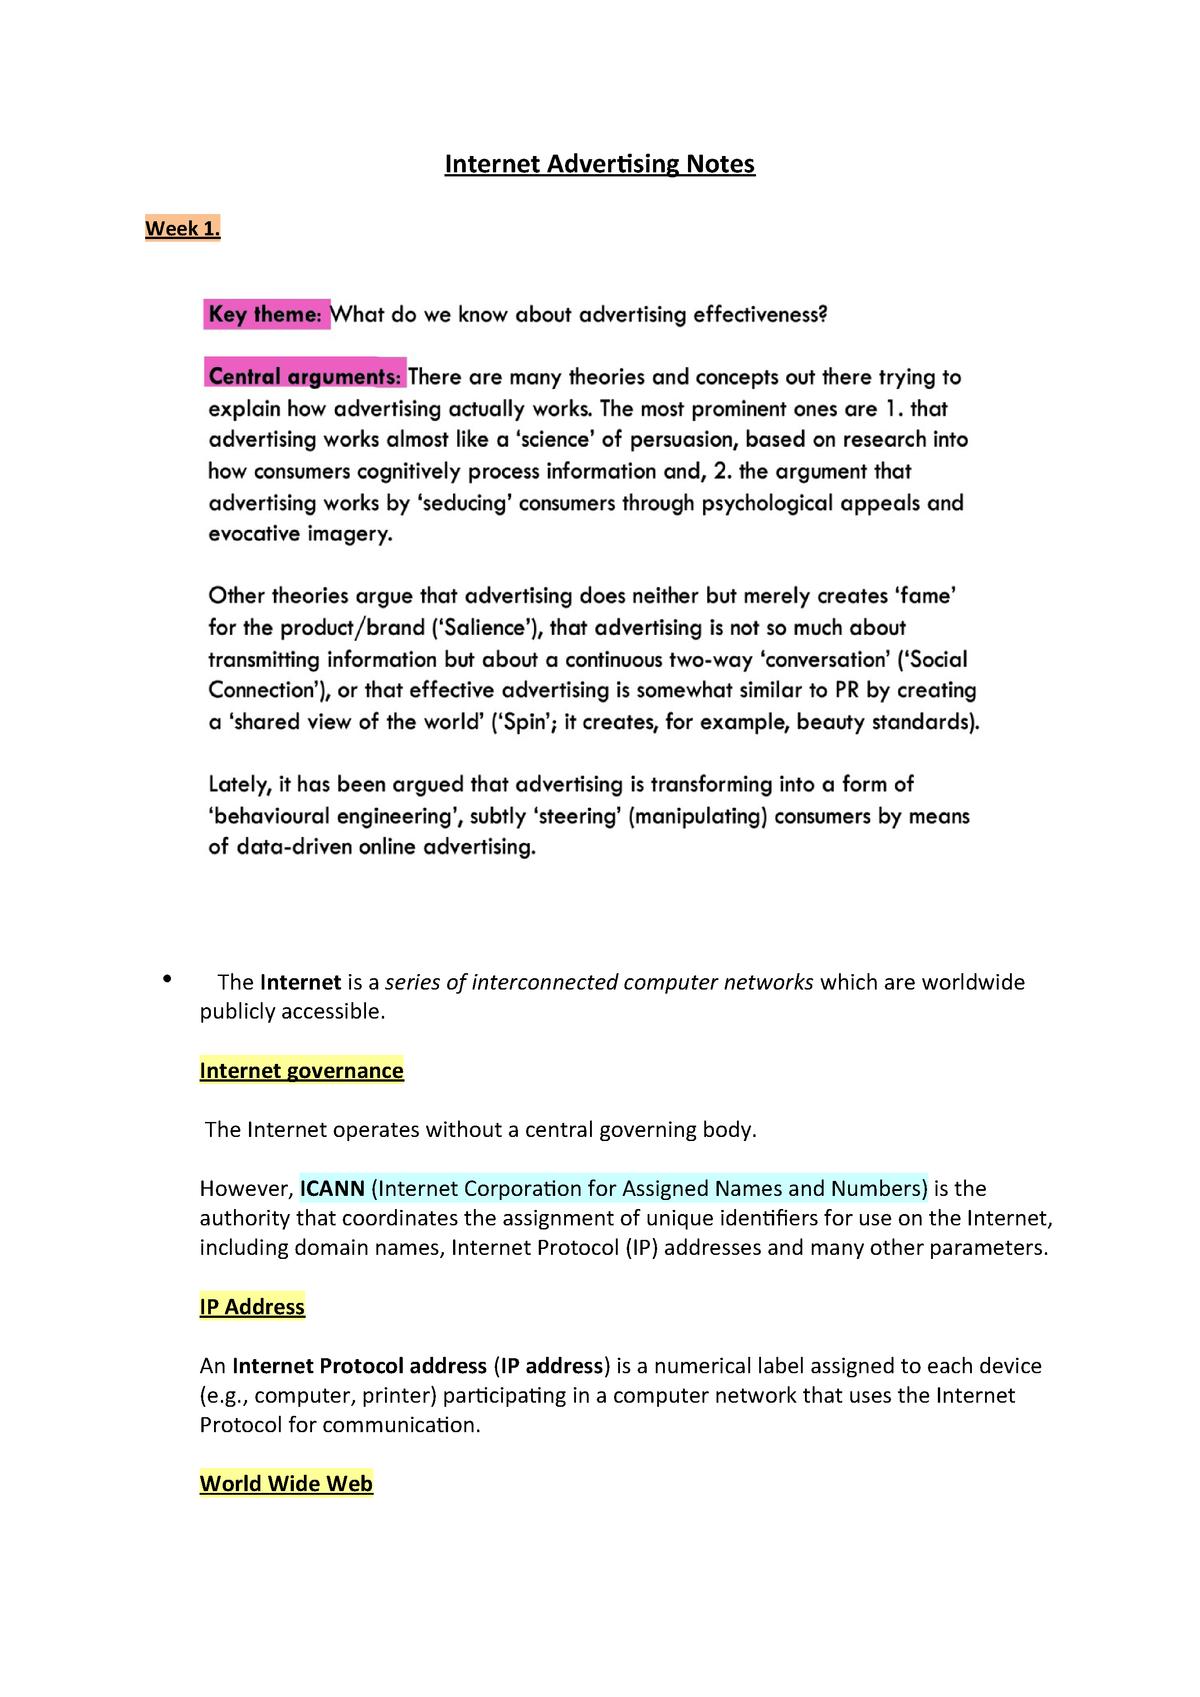 Internet Advertising Notes - ADVT11-140: Internet Advertising - StuDocu